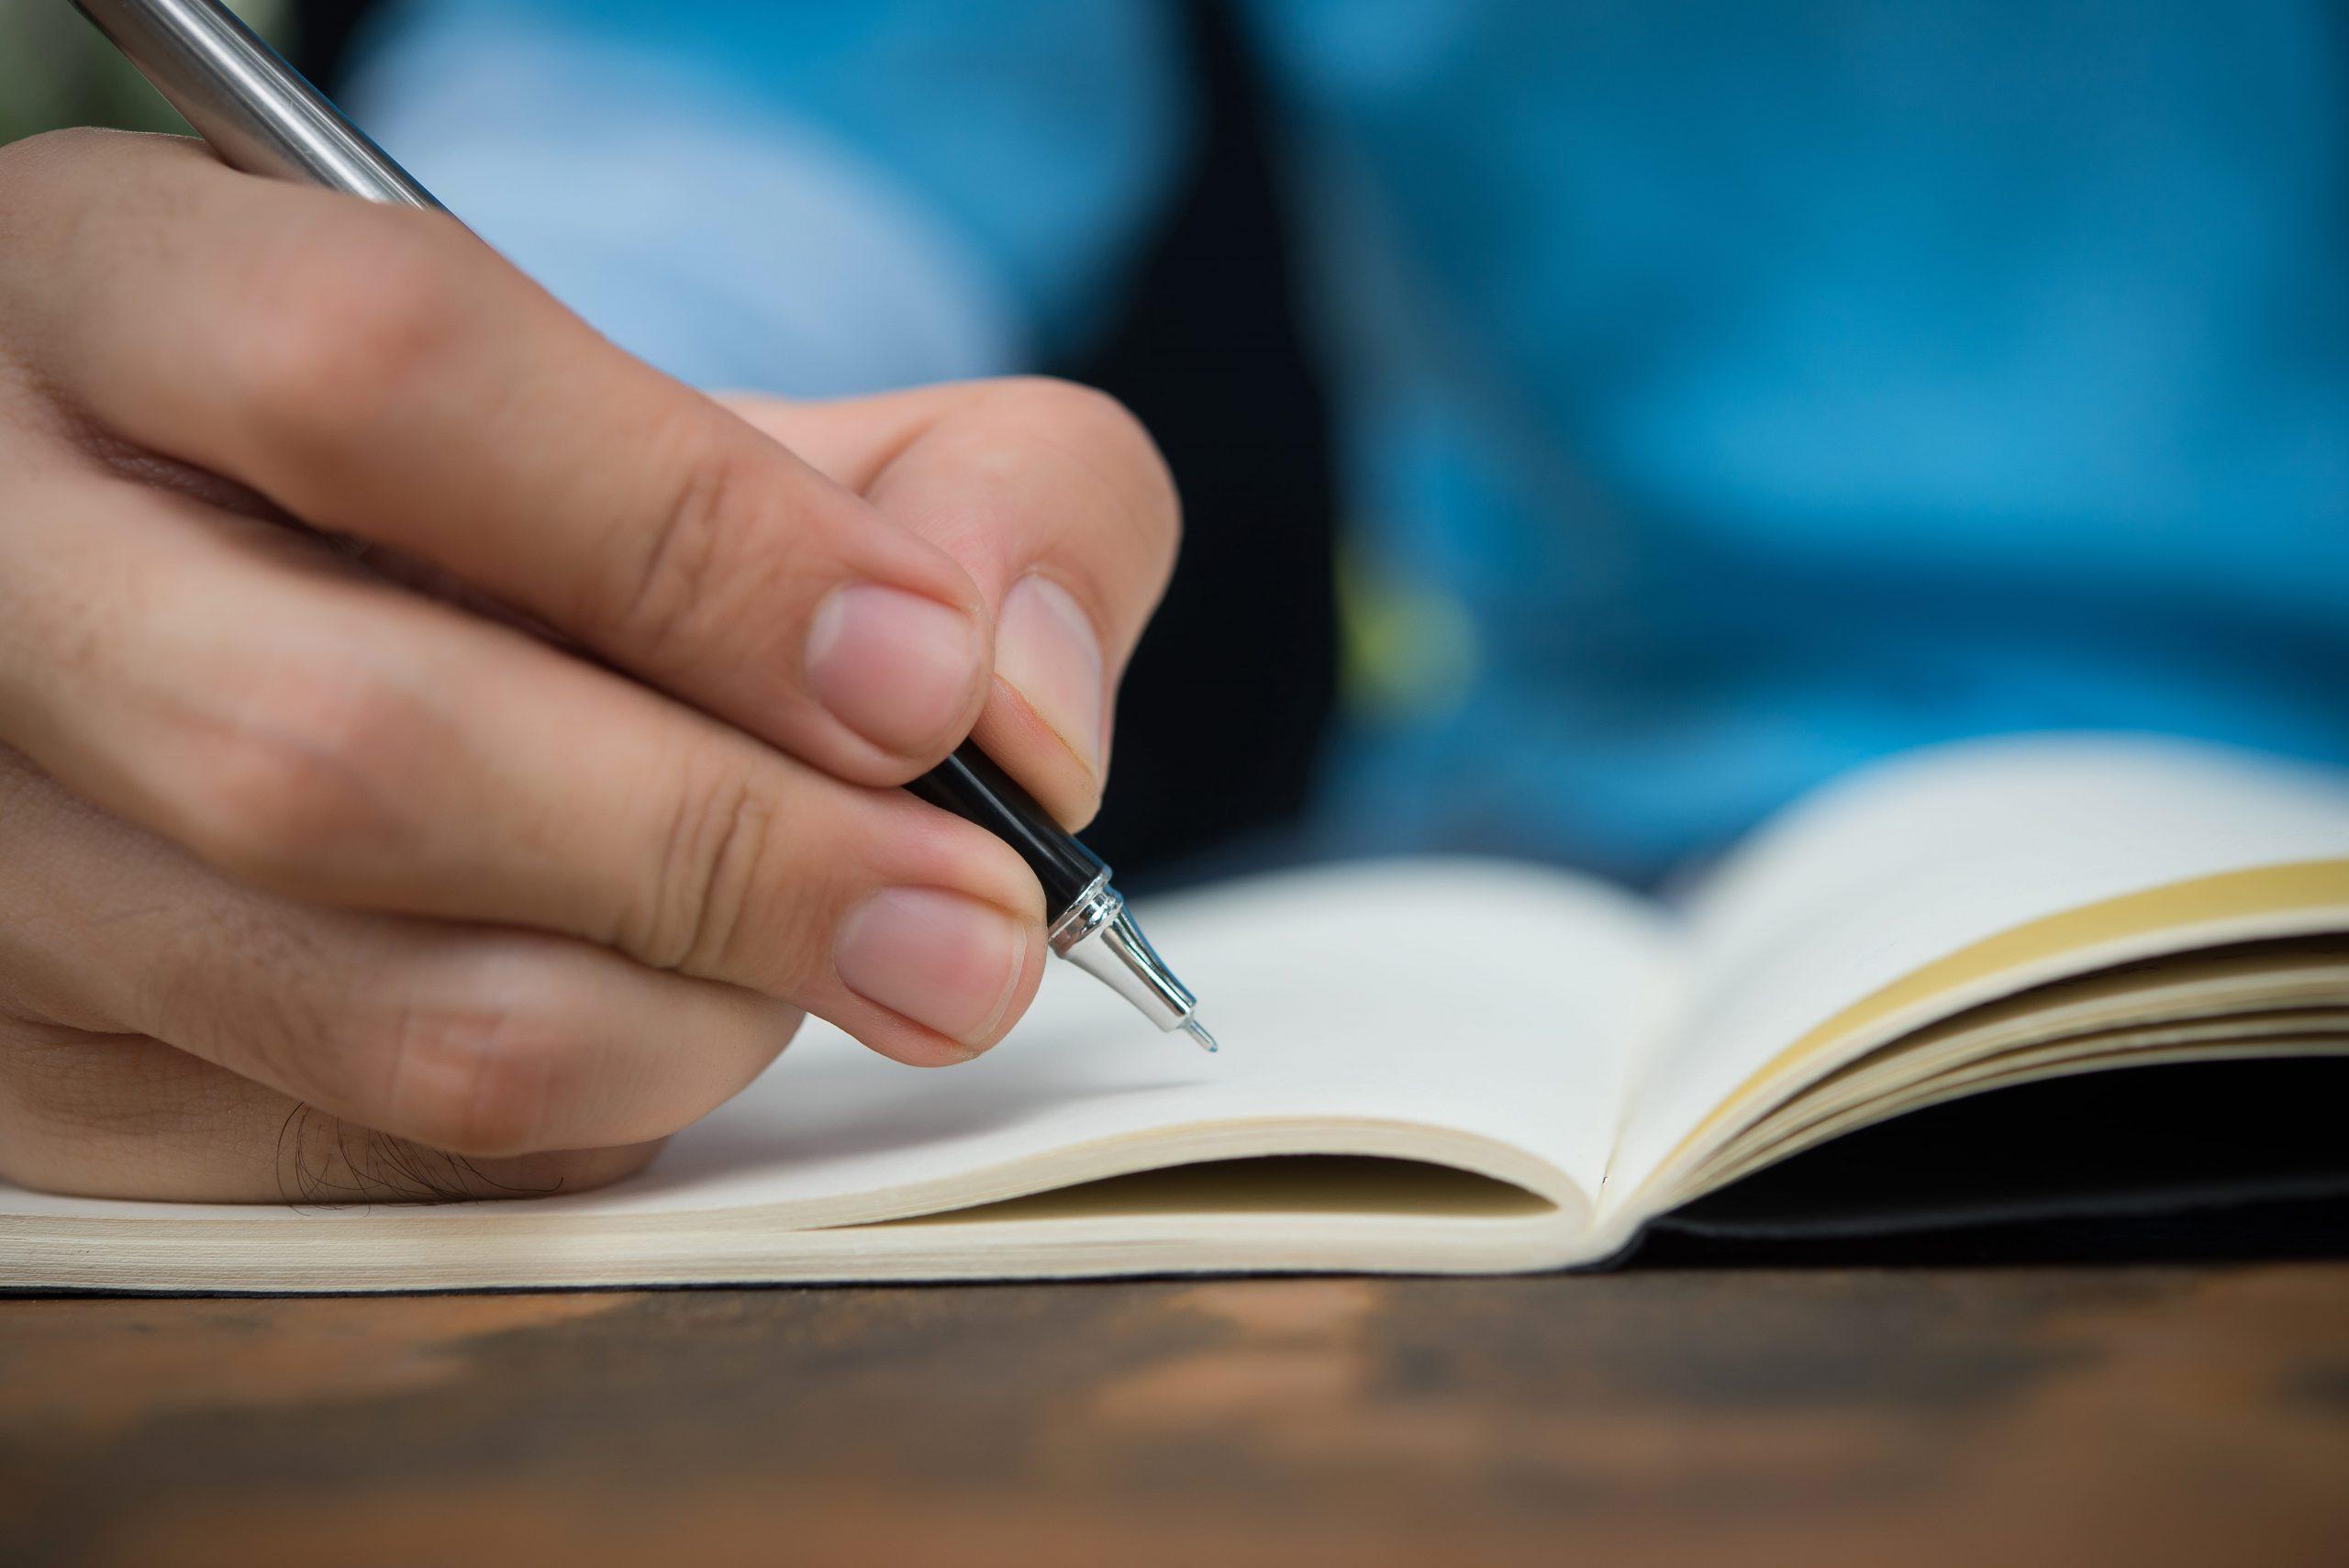 man-hand-write-on-the-notebook-PVXM5DA